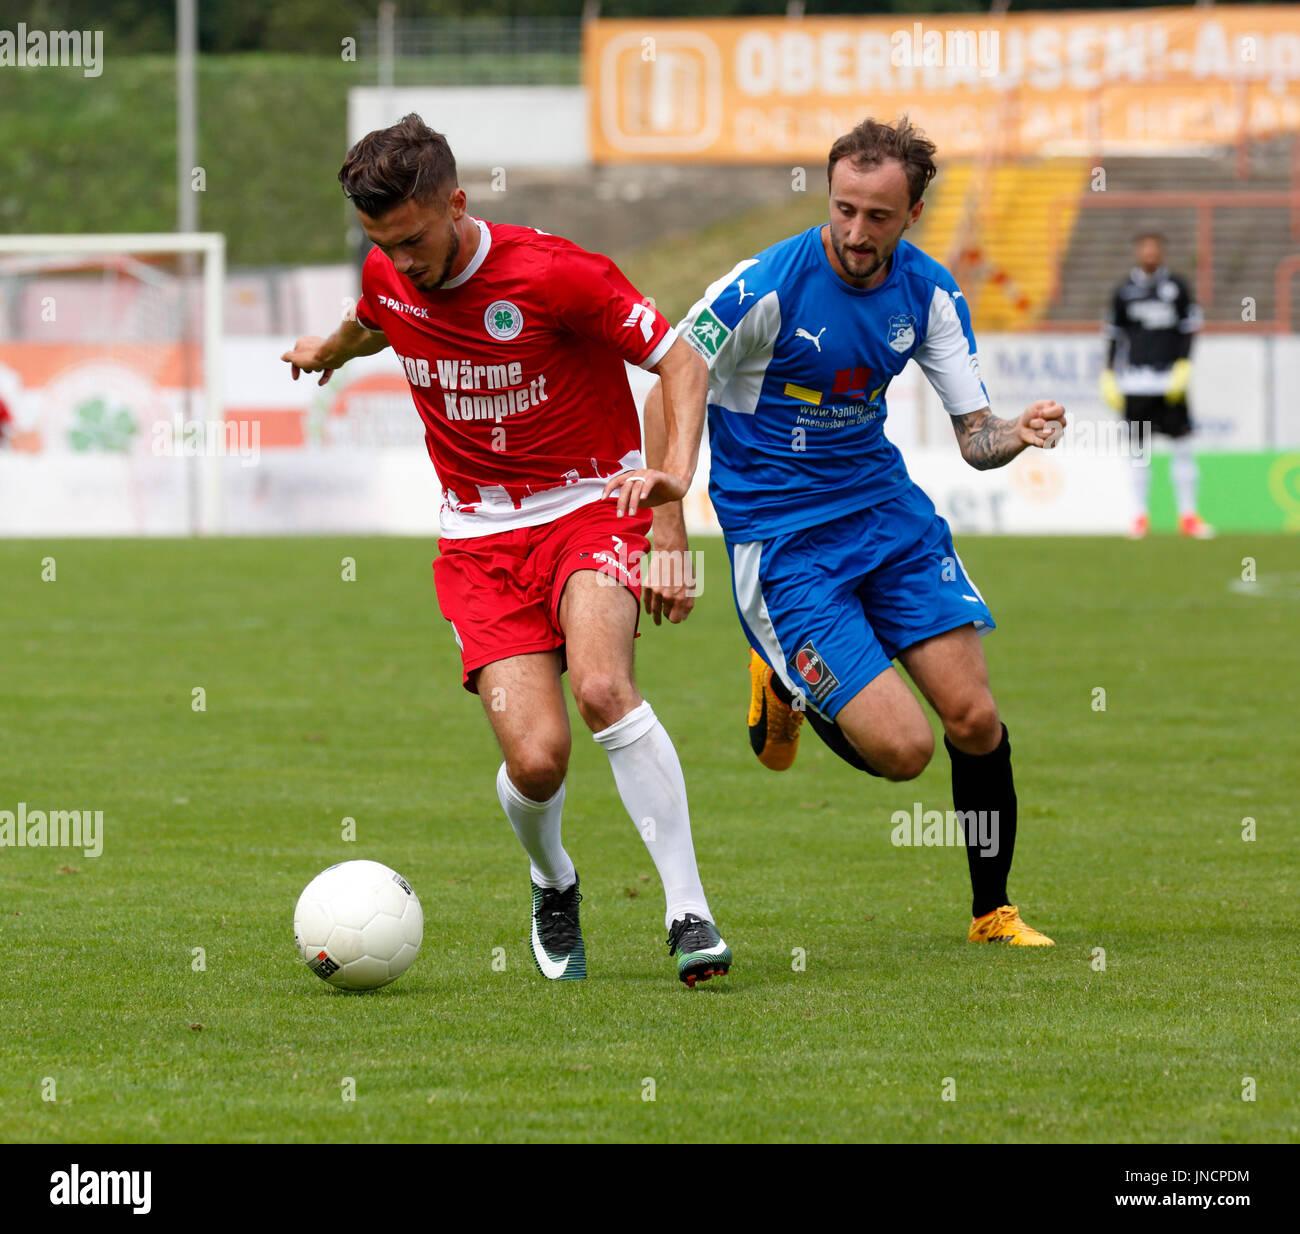 sports,football,Regional League West,2017/2018,Rot Weiss Oberhausen vs SV Westfalia Rhynern 2:1,Stadium Niederrhein in Oberhausen,scene of the match,Enes Topal (RWO) left and Sven Ricke (Rhynern) - Stock Image